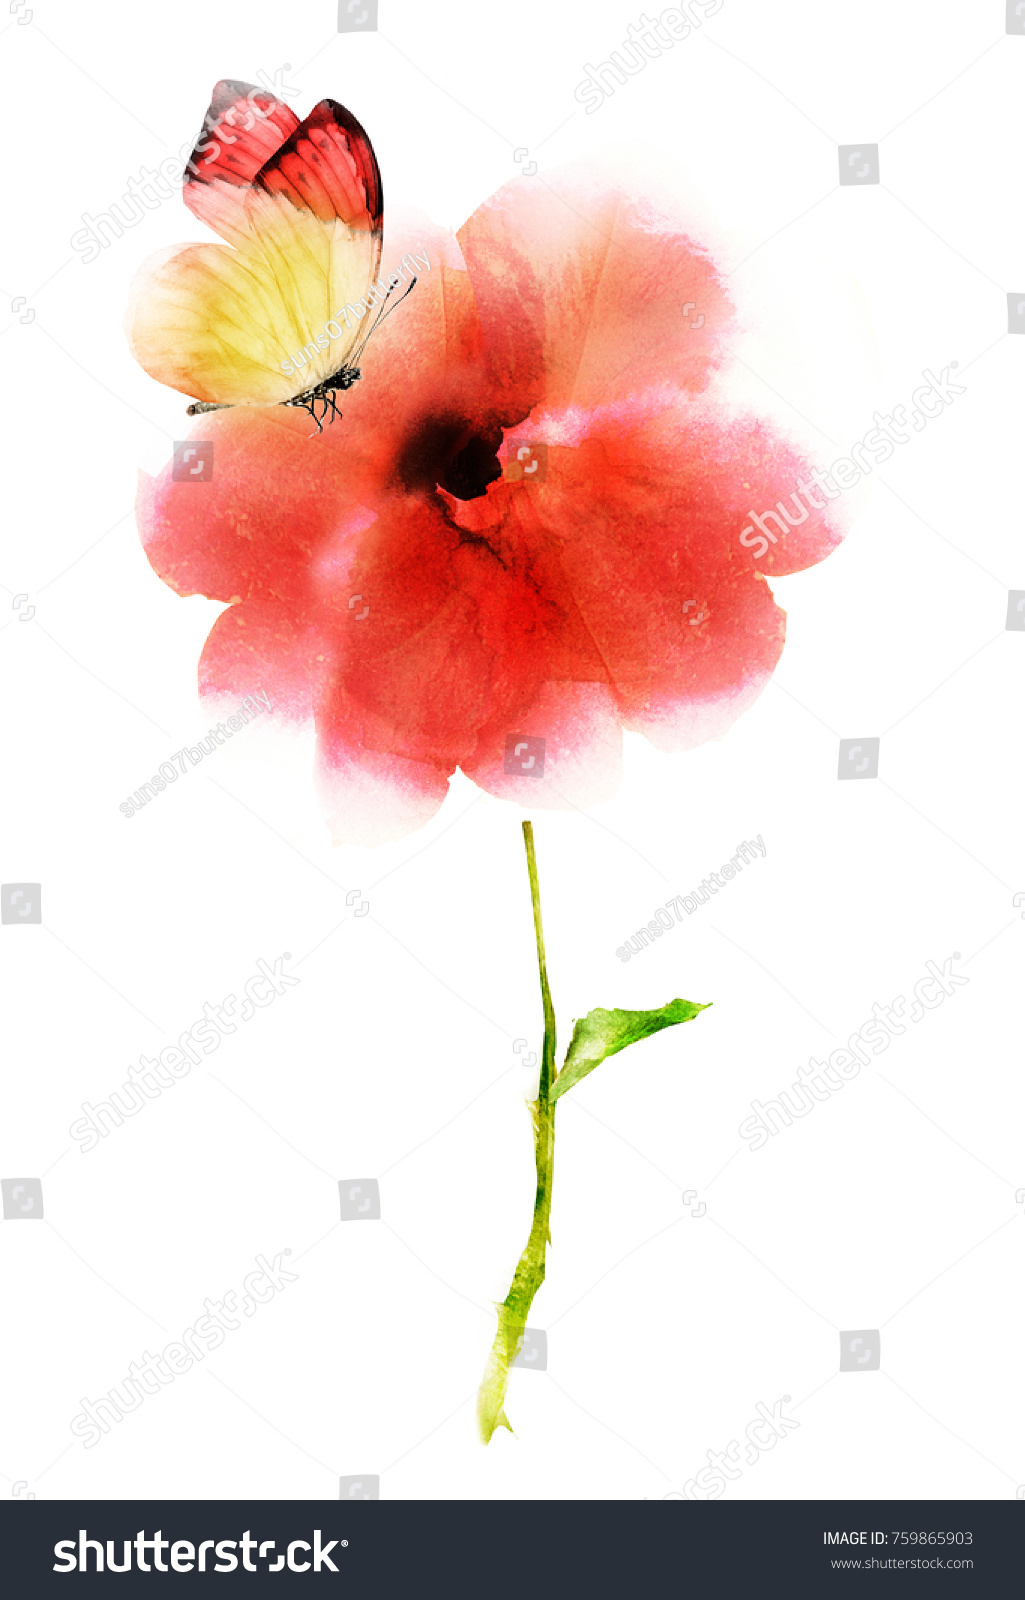 Watercolor flower on white | EZ Canvas